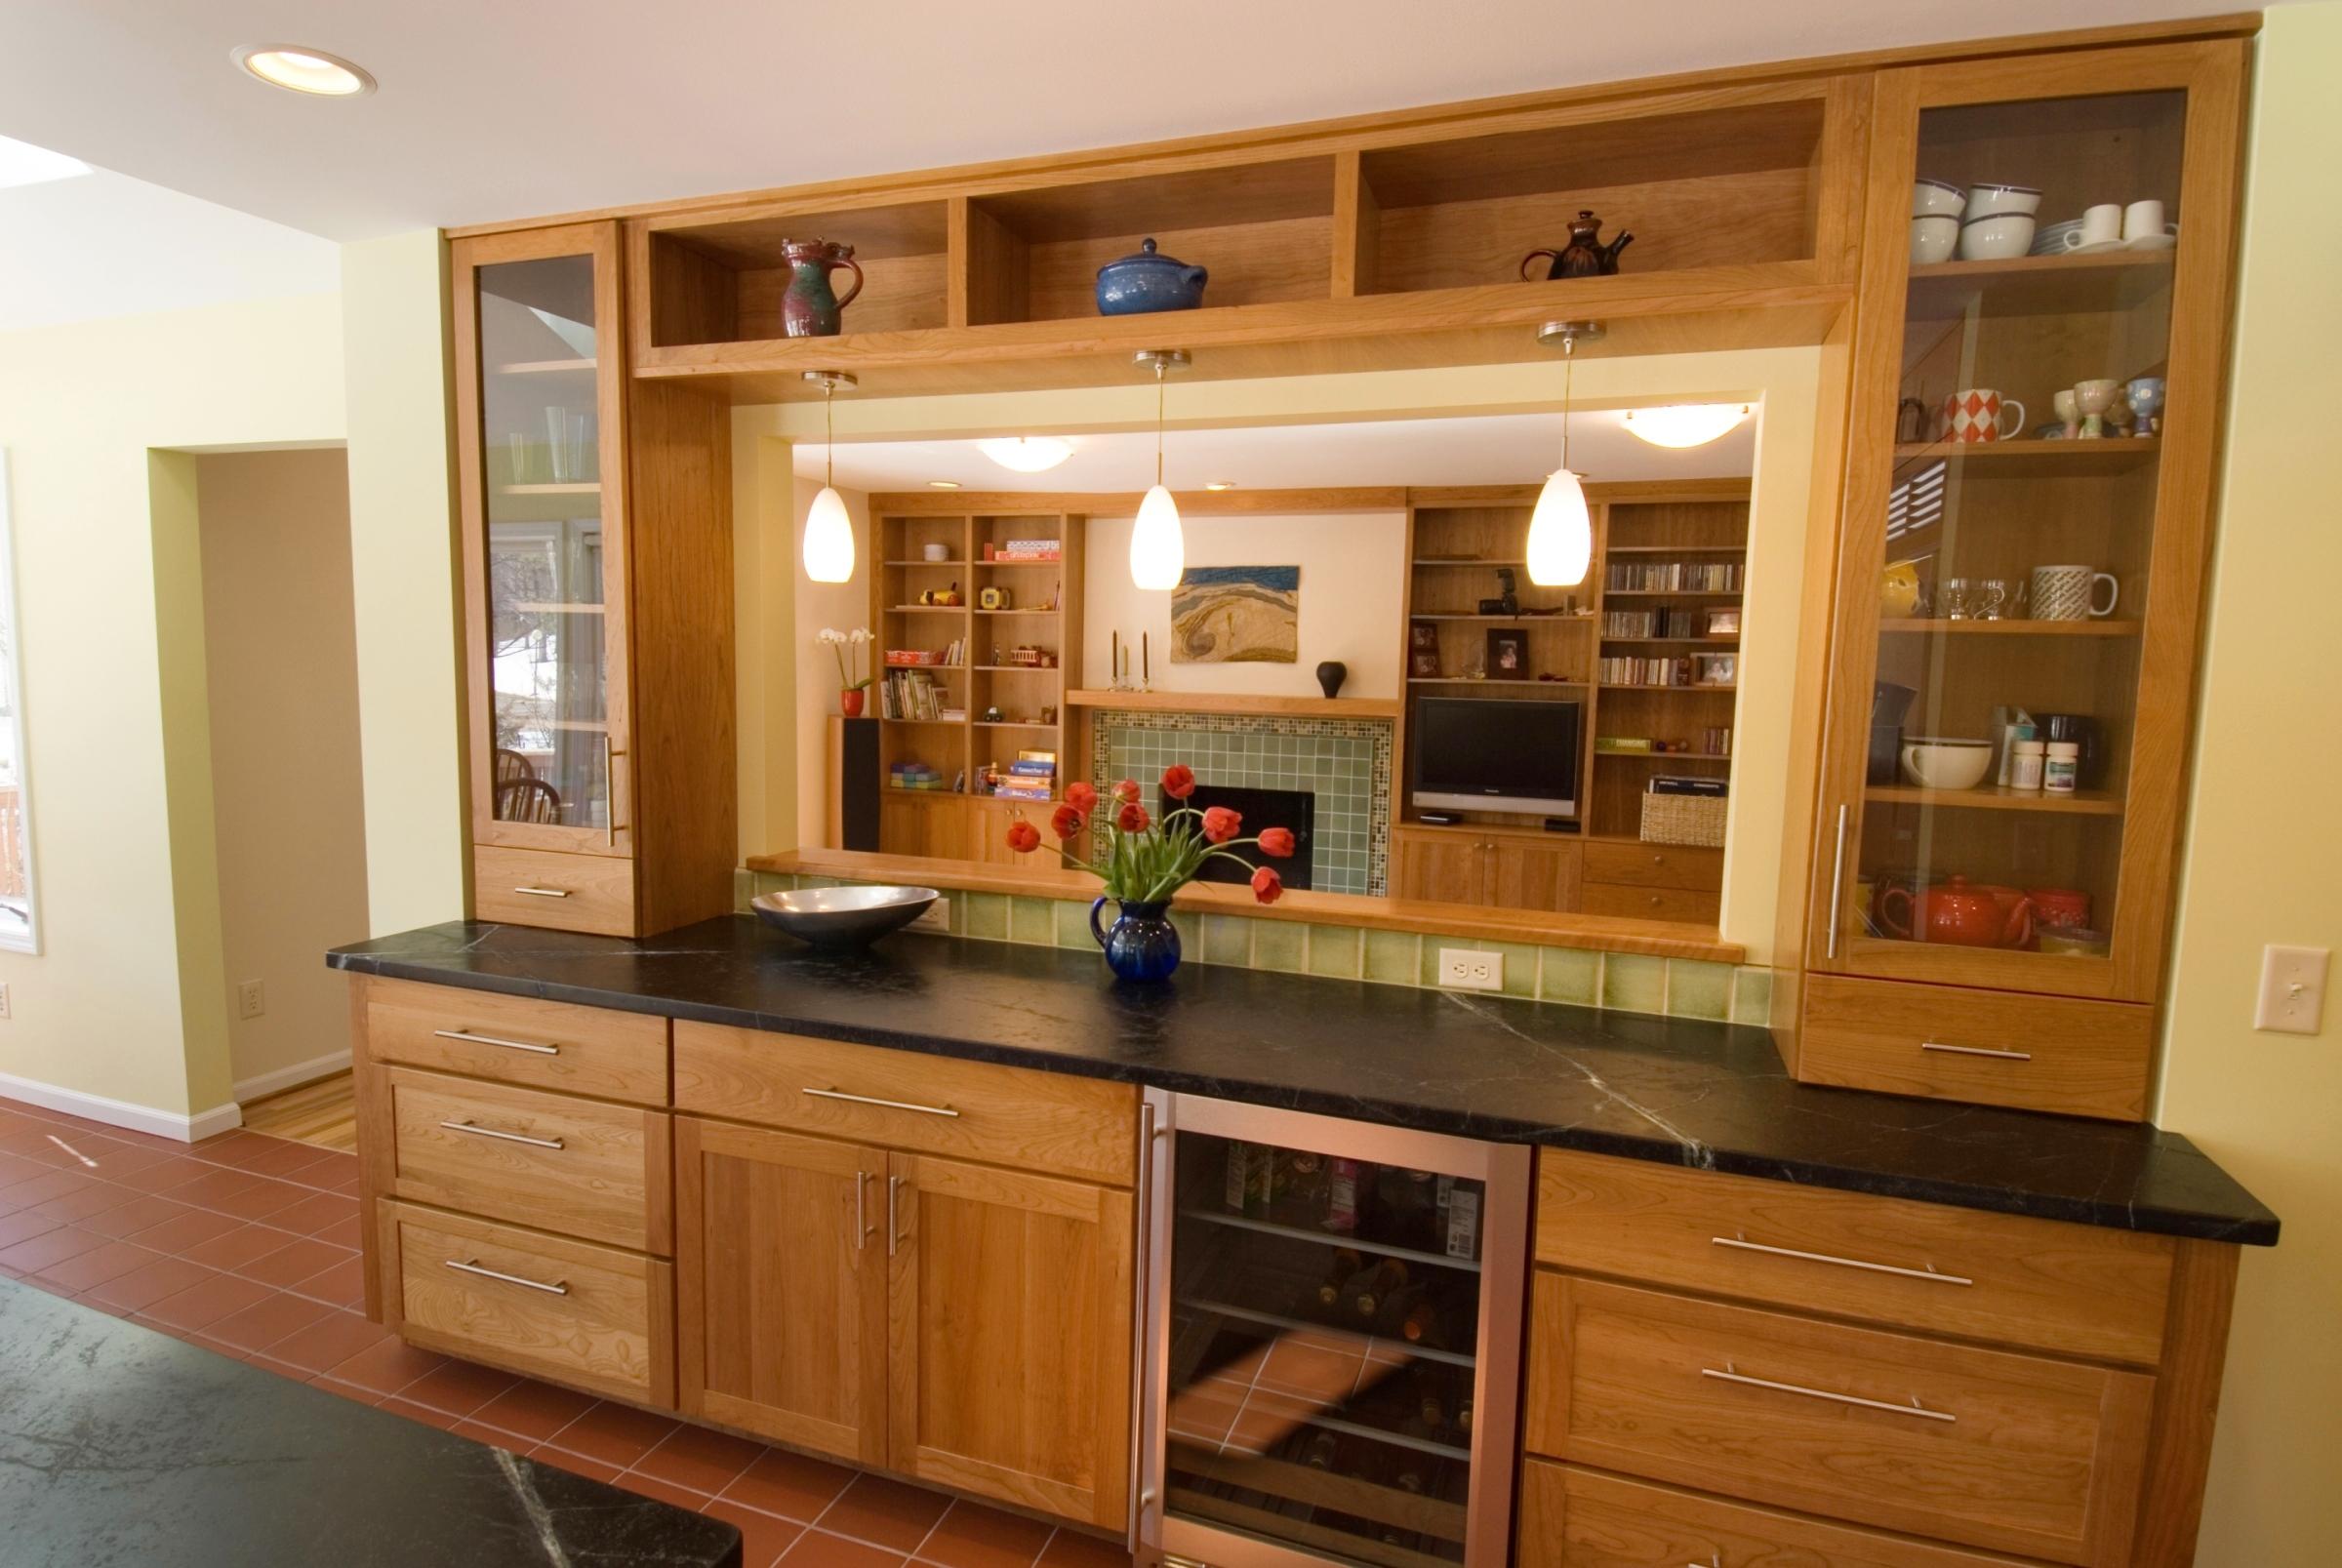 Kitchens_07.jpg